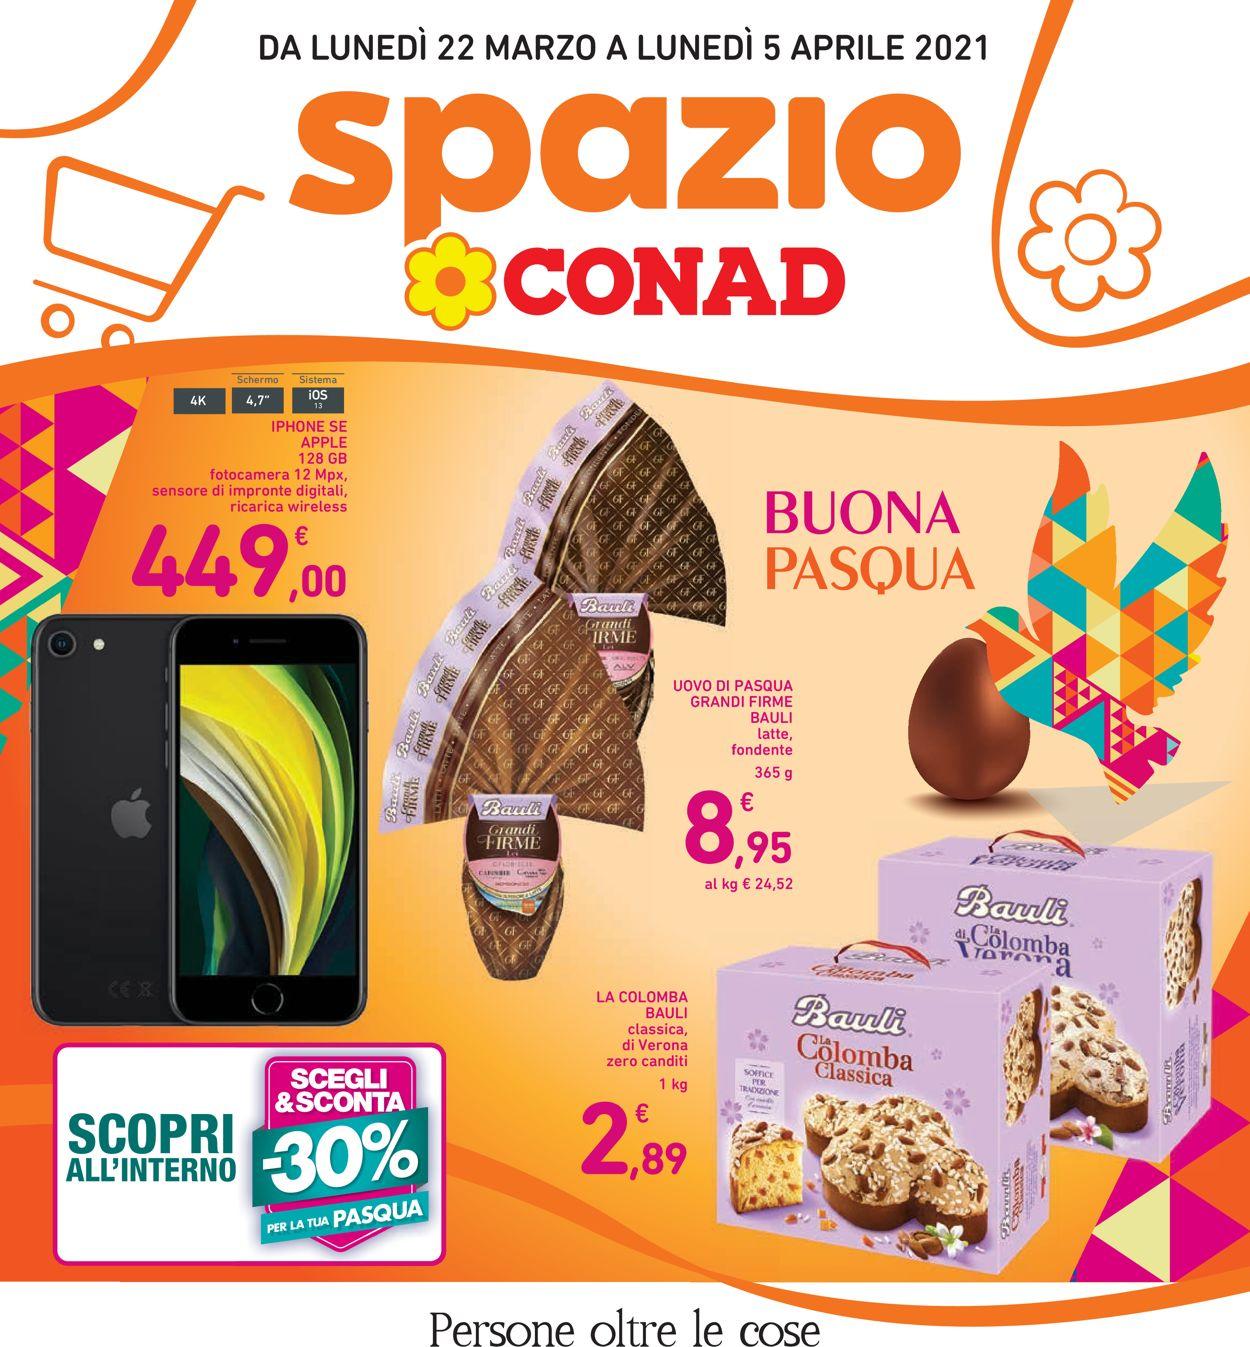 Volantino Conad - Pasqua 2021! - Offerte 22/03-05/04/2021